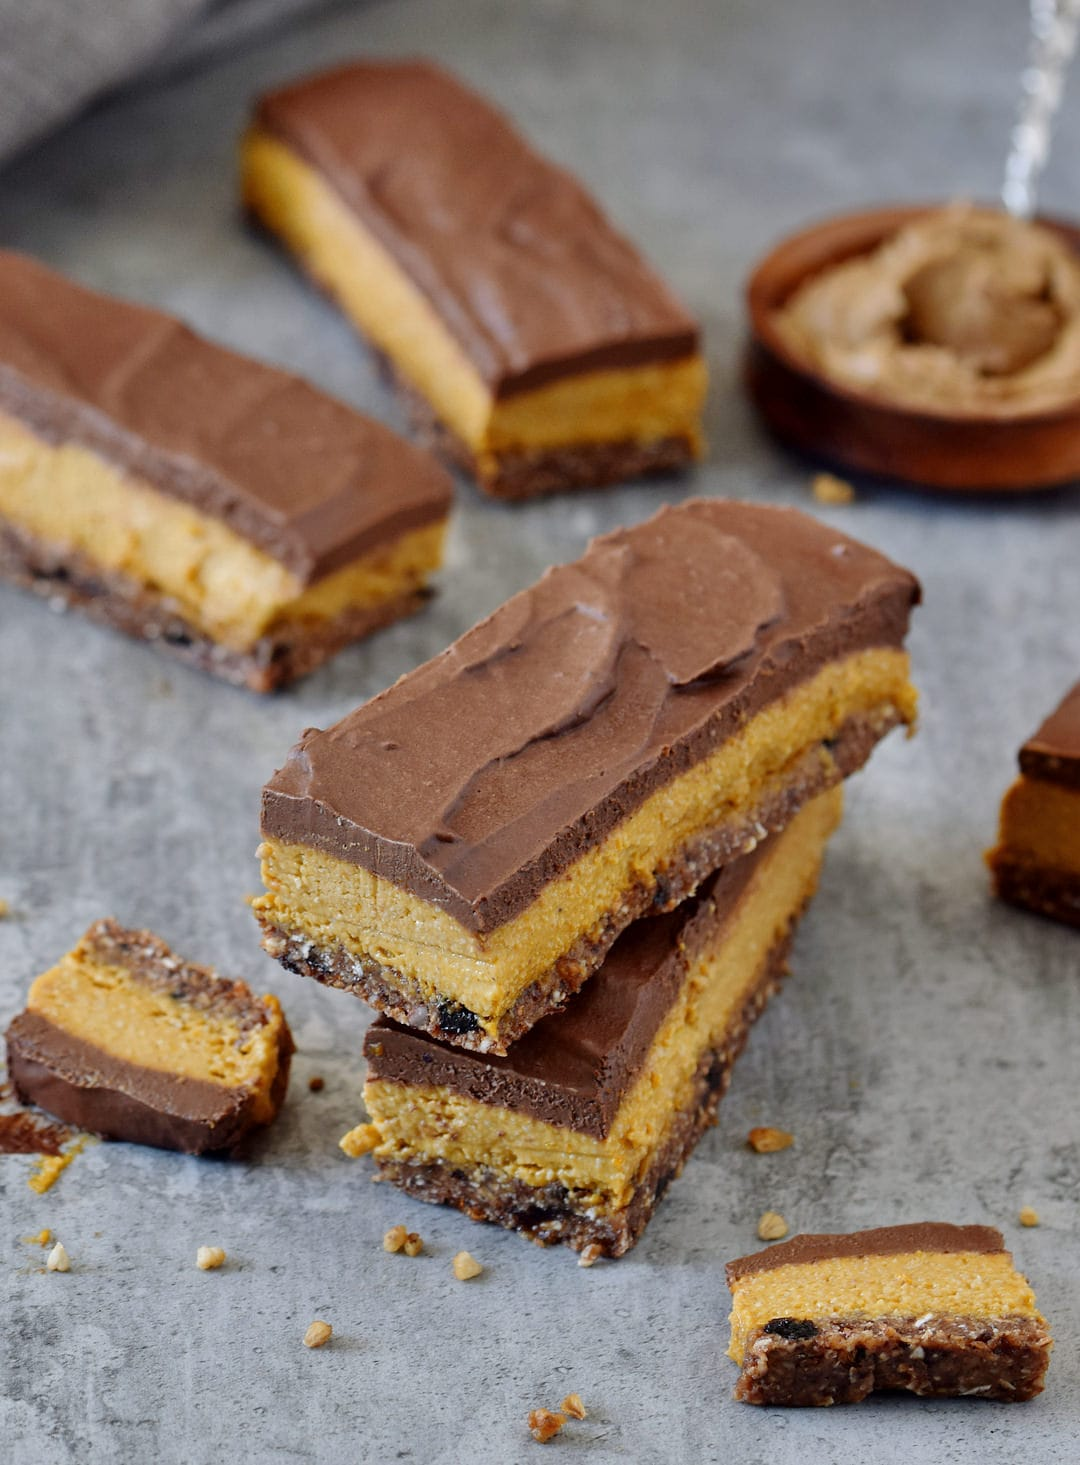 Creamy no bake pumpkin bars with a vegan and gluten-free chocolate glaze